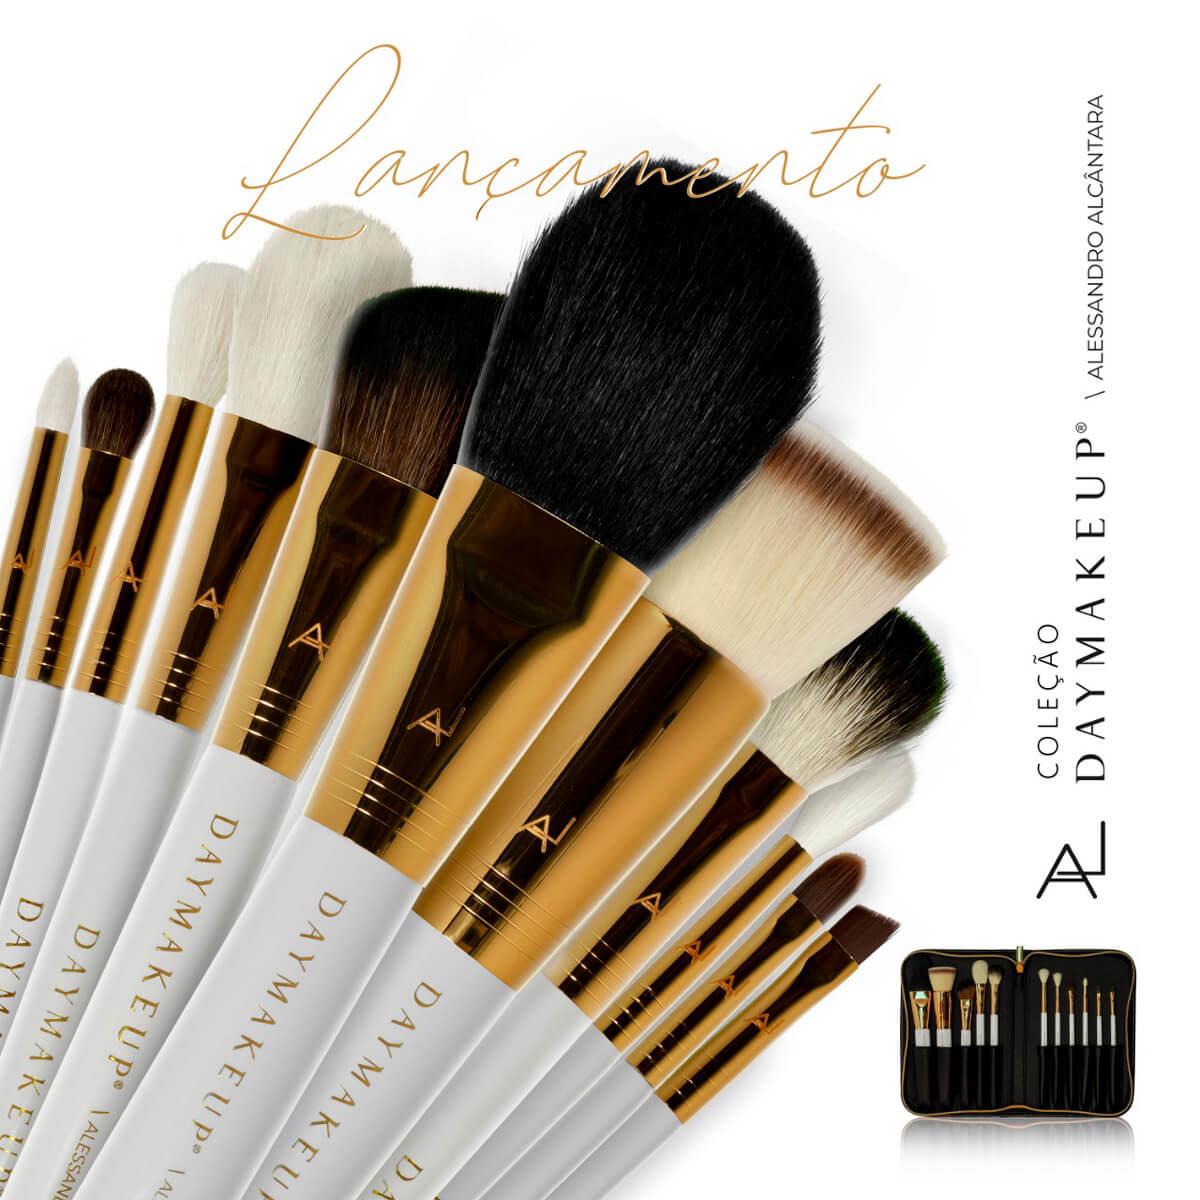 Kit de pinceis- Alessandro Alcântara - Day Makeup